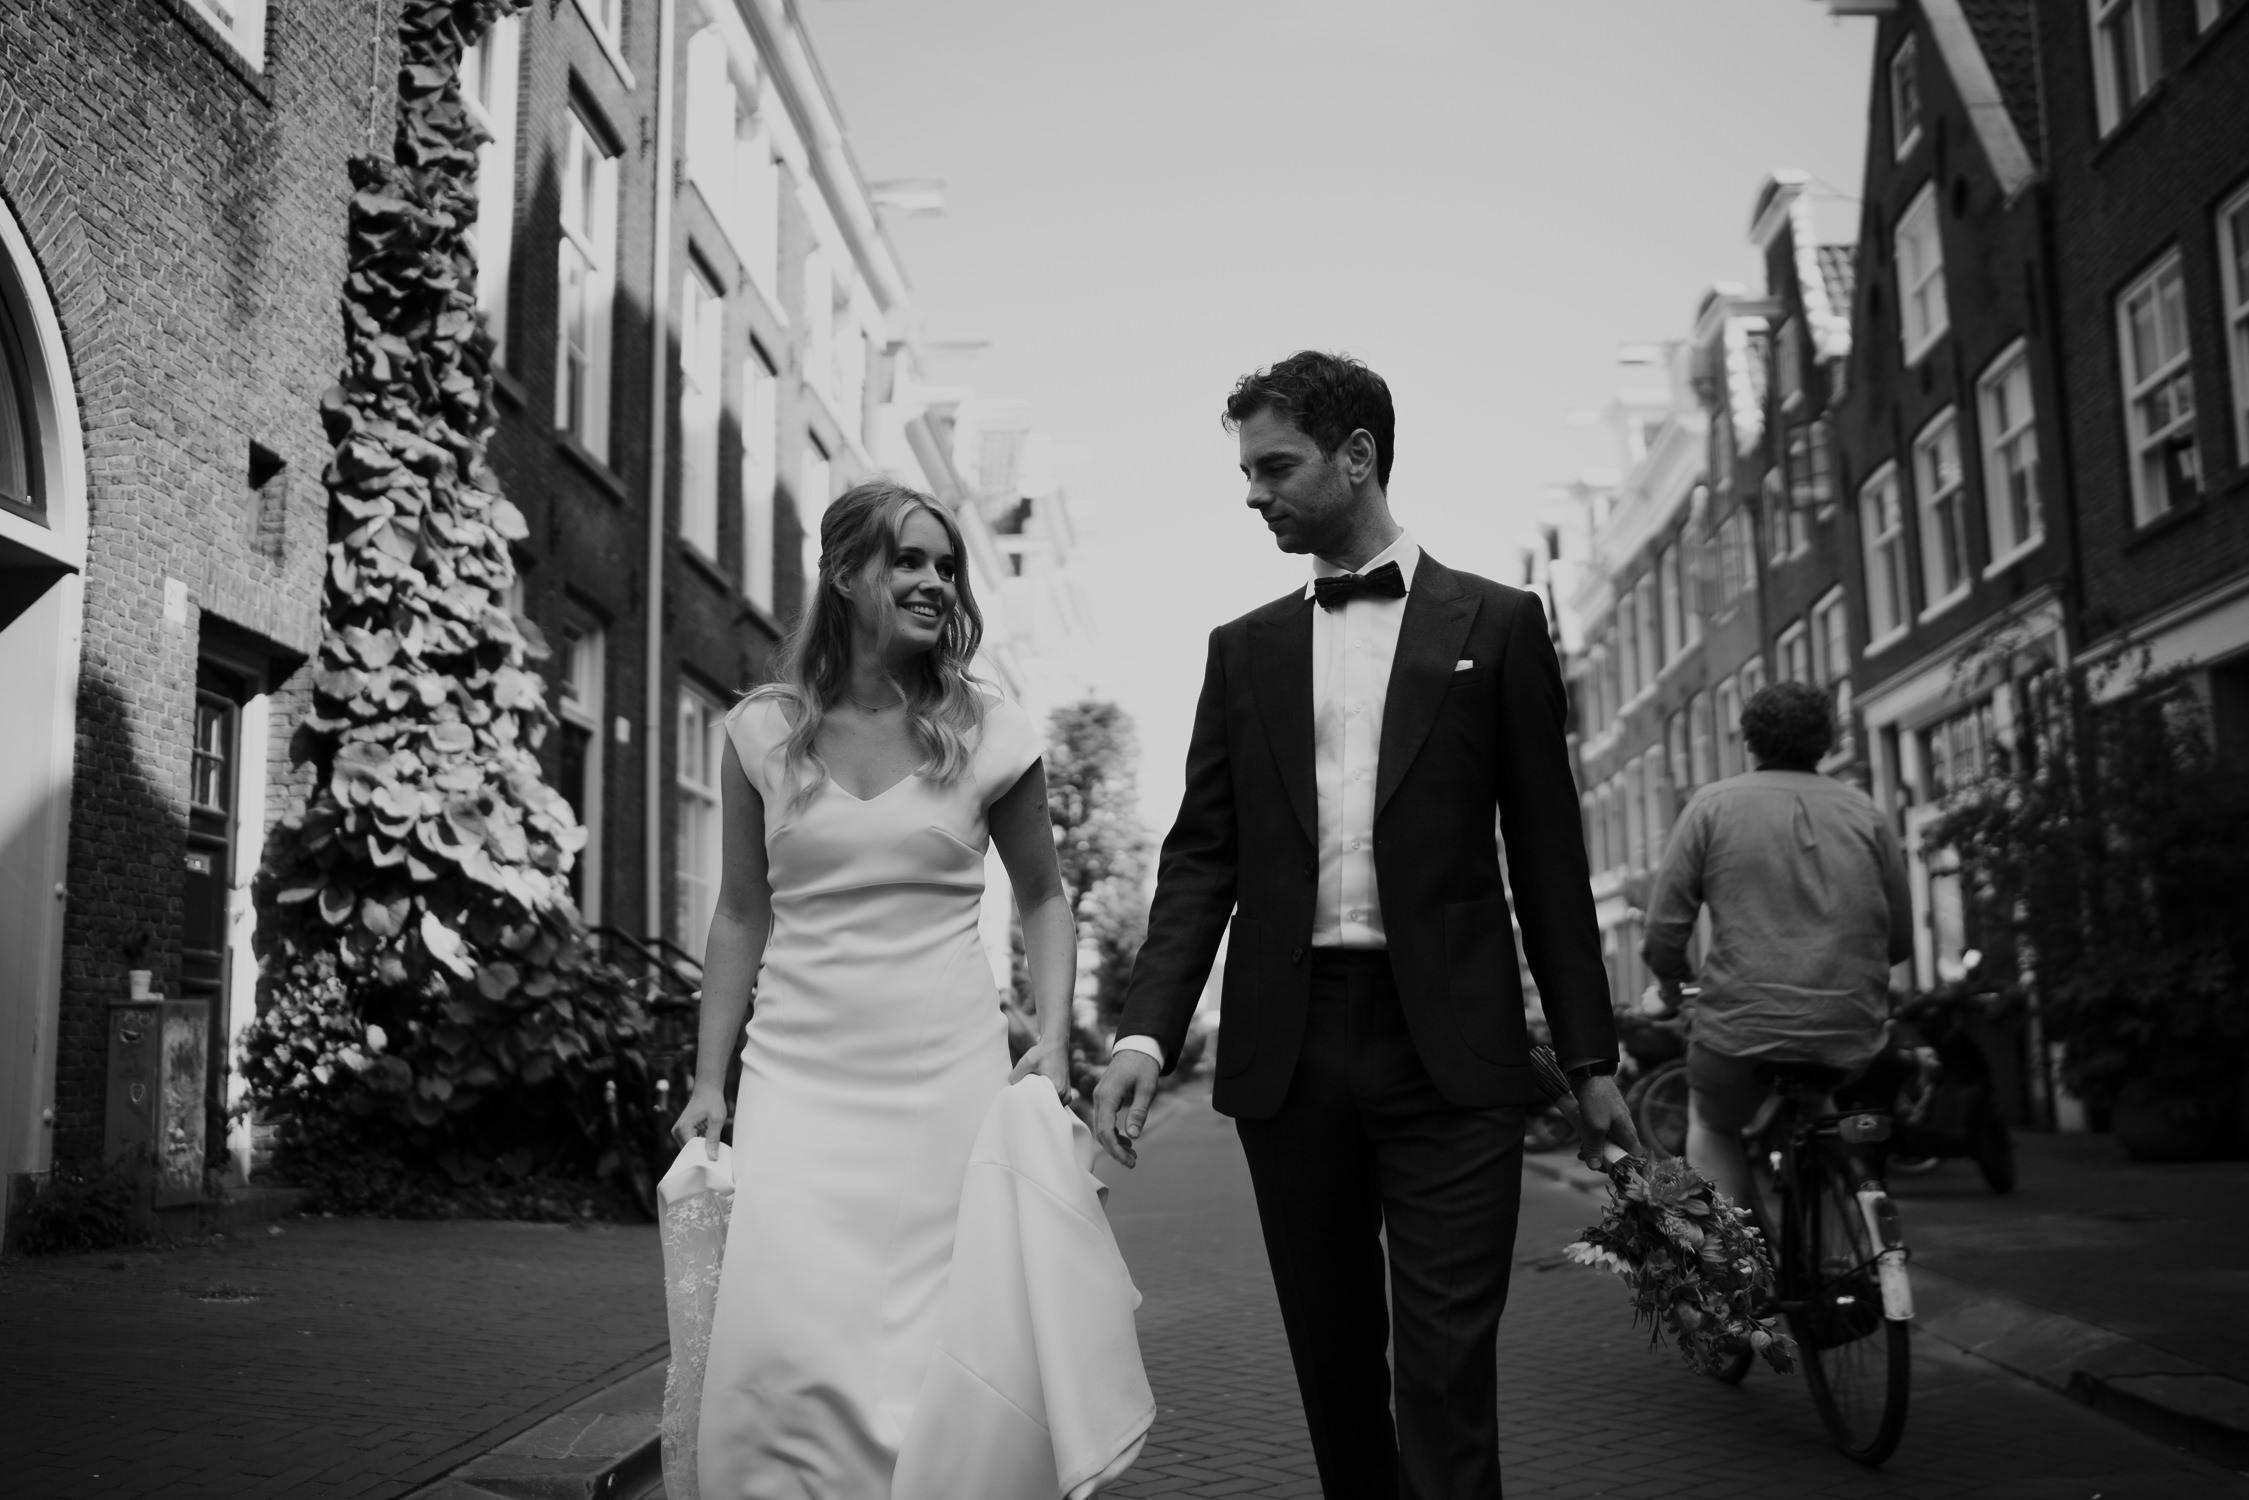 Beautiful wedding in Amsterdam photographed by wedding photographer Mark Hadden